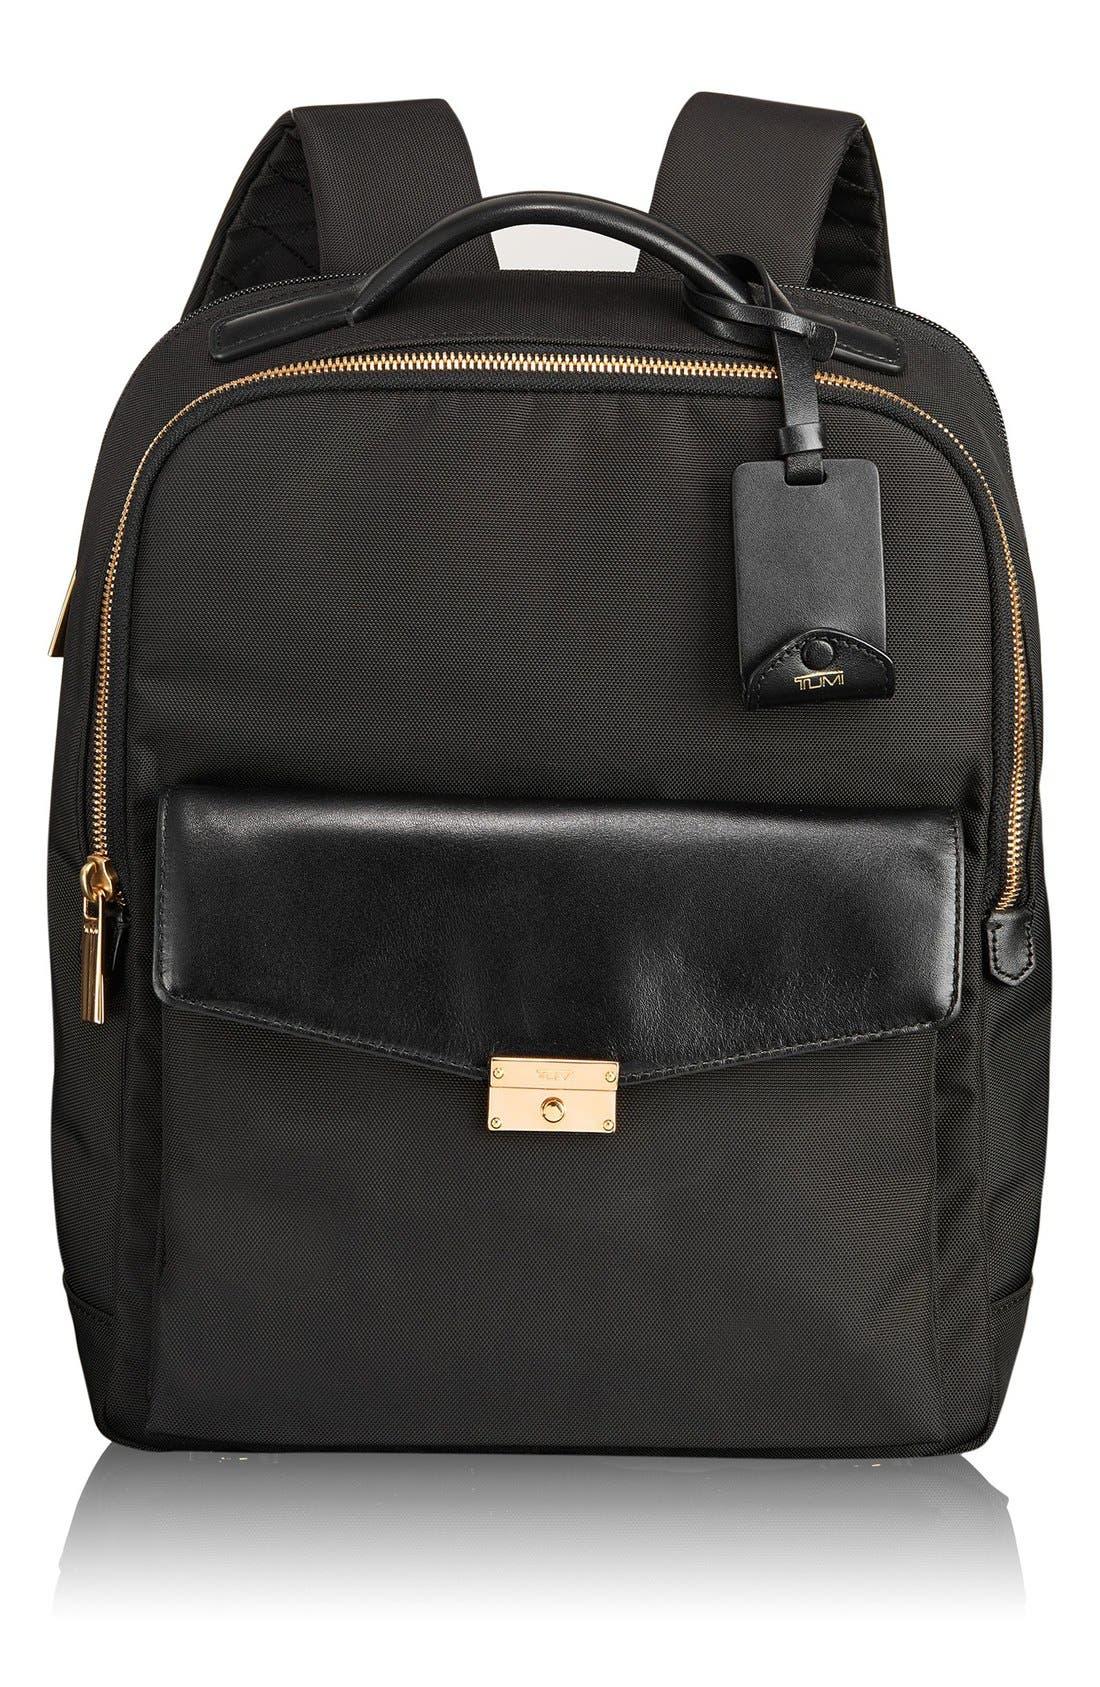 'Larkin Laurel' Nylon Commuter Backpack,                             Main thumbnail 1, color,                             001